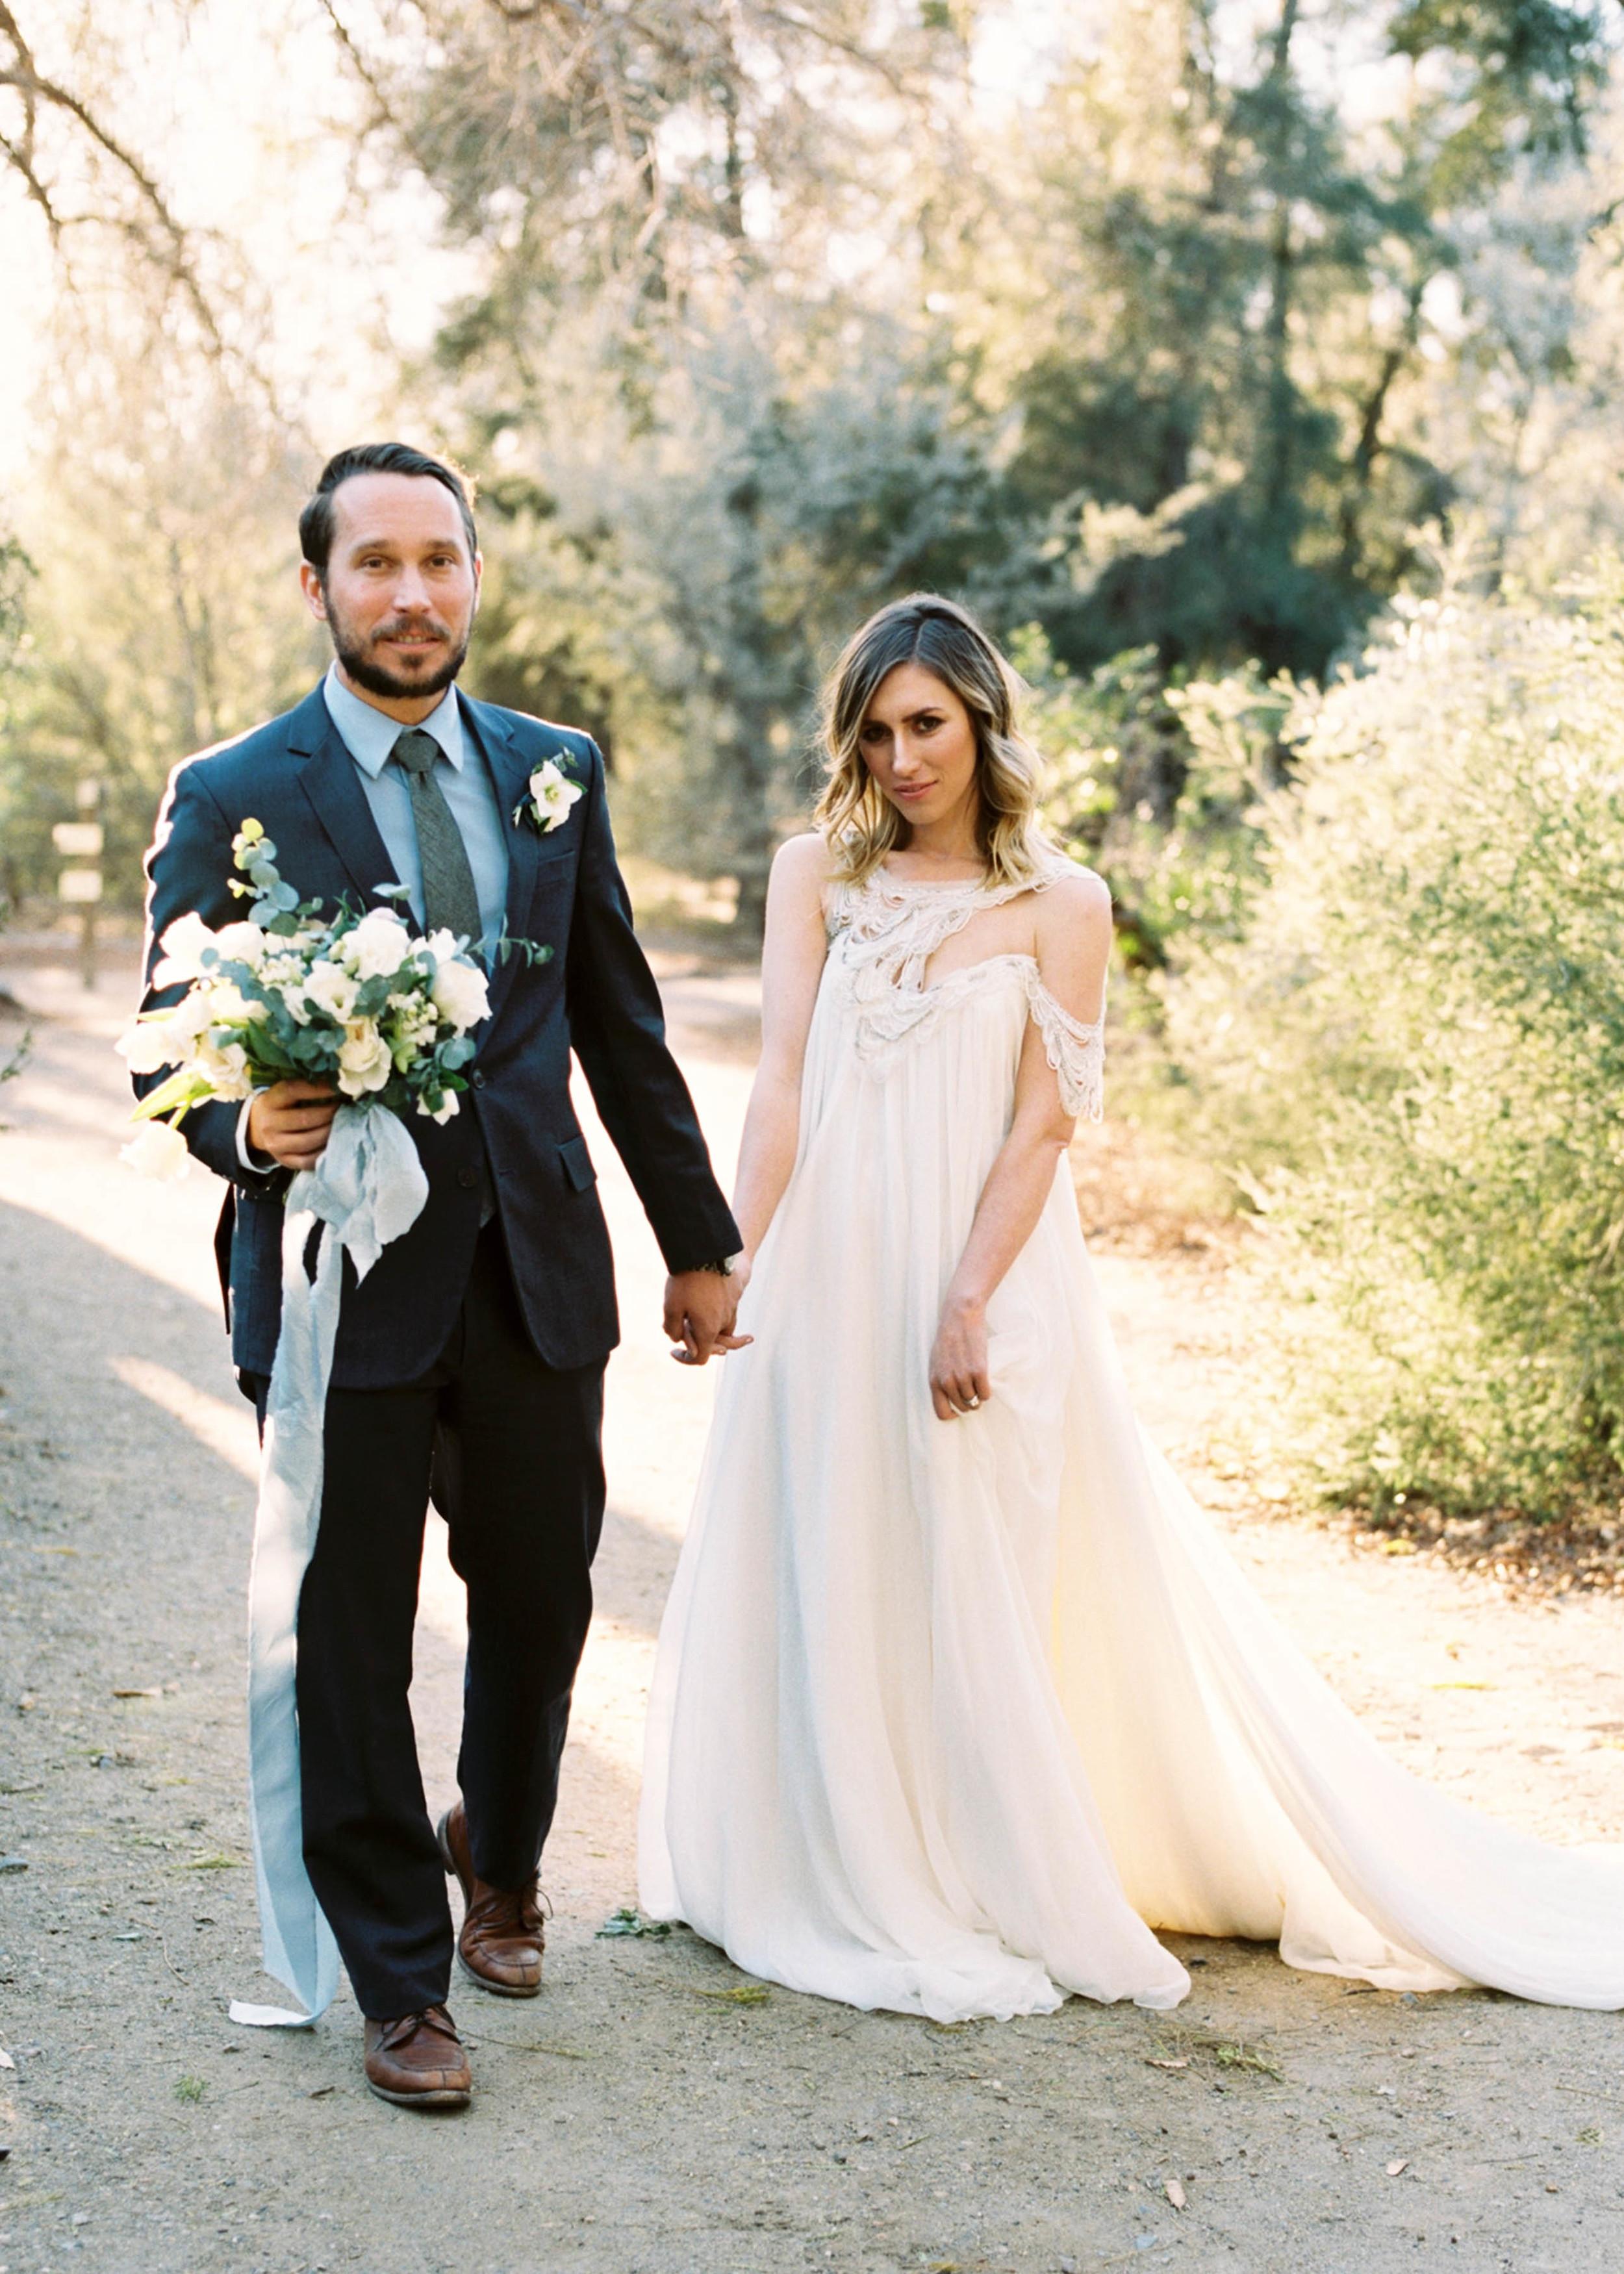 Danford-Photography-Bozeman-Montana-Arizona-Fine Art Film-Wedding-Engagement-Photographers-15.jpg